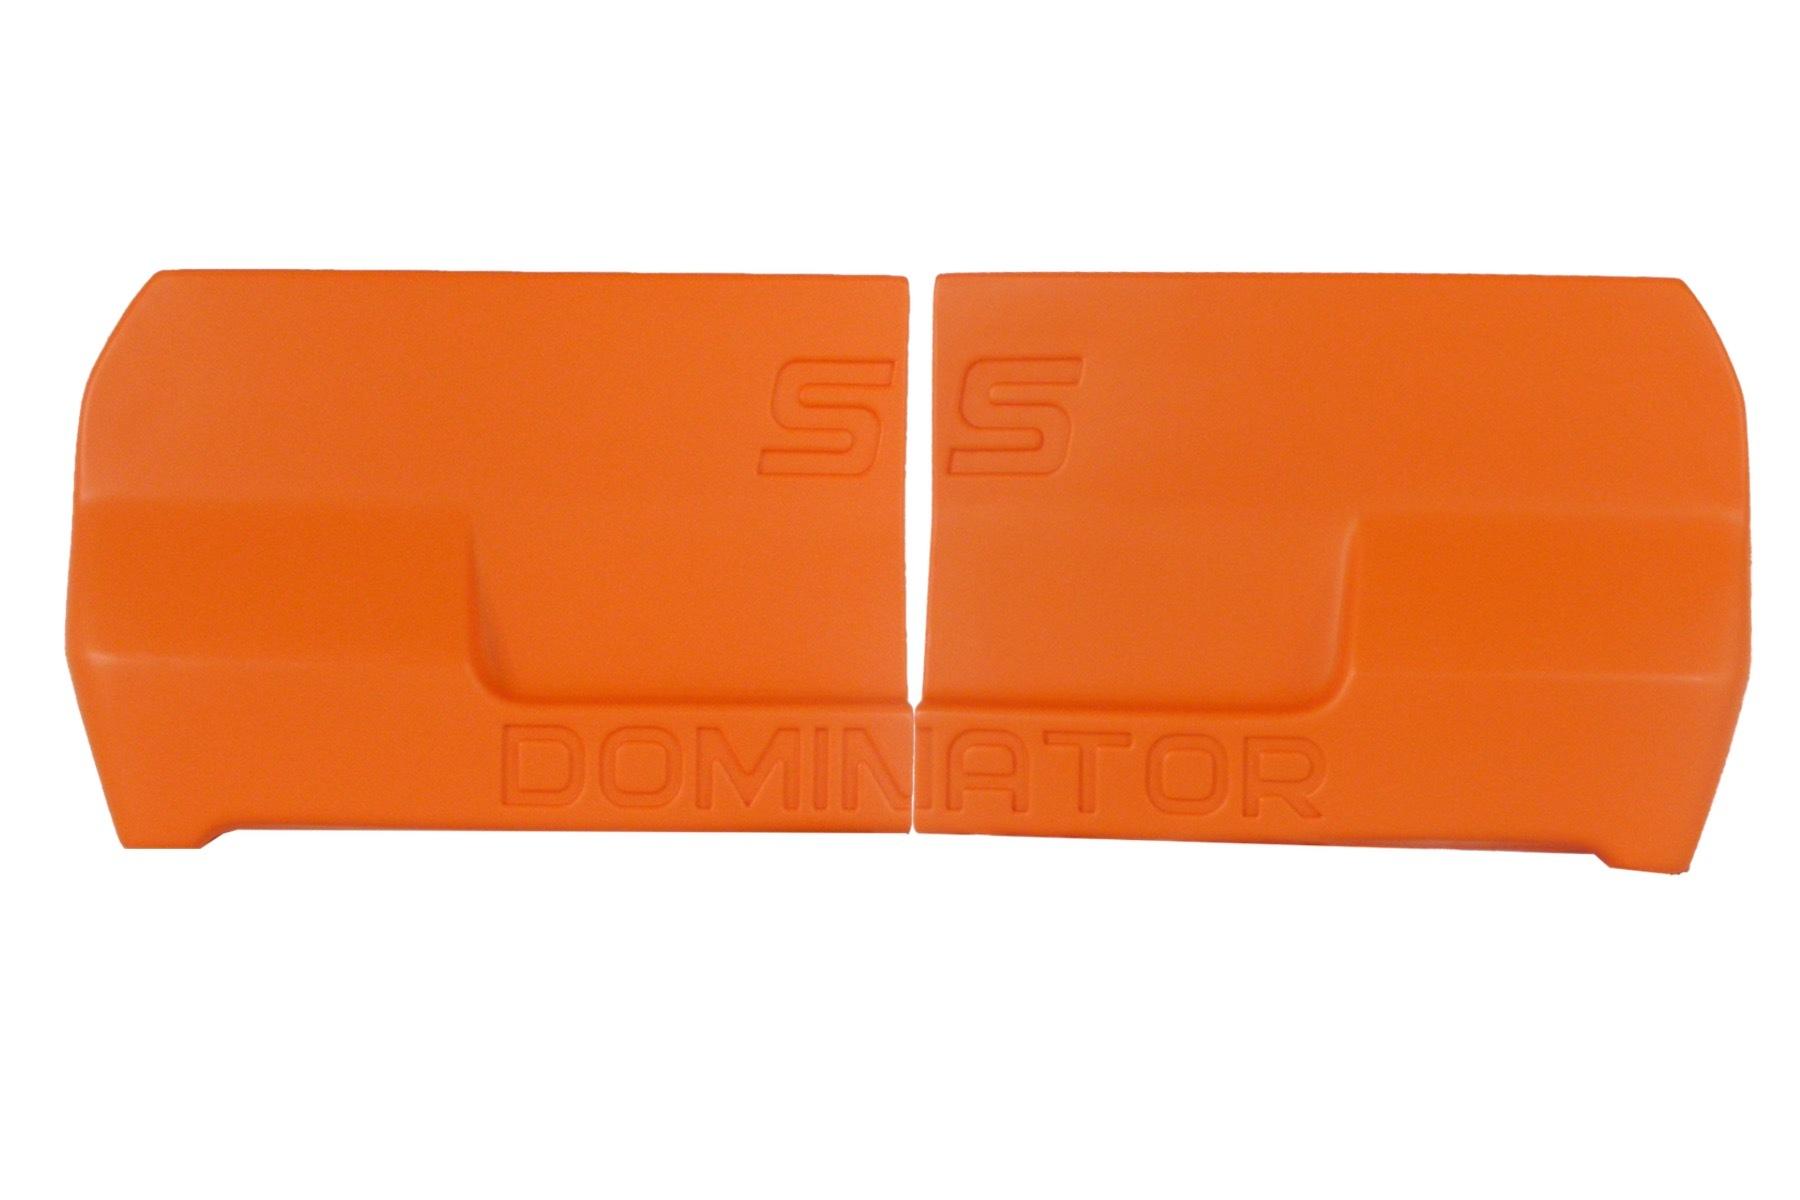 Dominator Racing Products SS Tail Orange Dominator SS